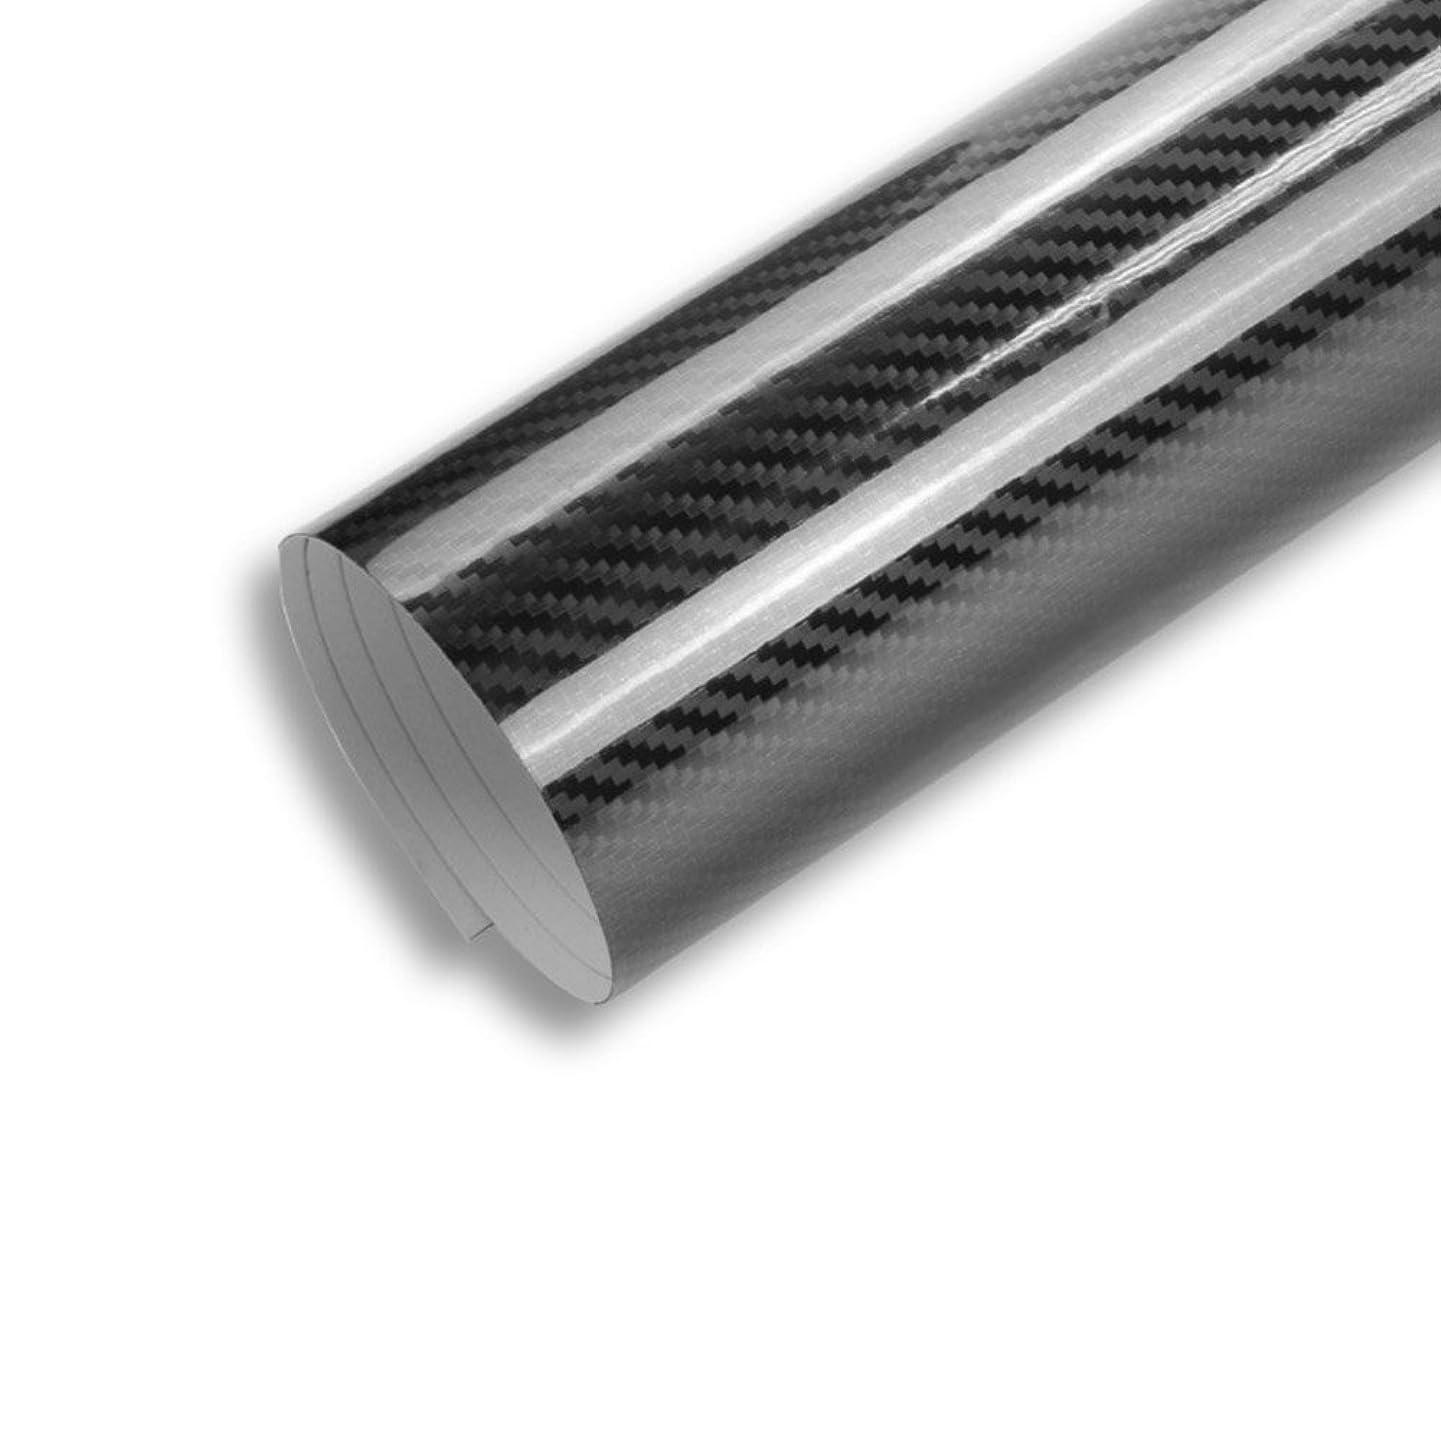 TECKWRAP 1ft x 5ft 5D High Gloss Black Carbon Fiber Vinyl Bubble Free Air Release Car Wrap Film Automotive DIY Decals u105336829060119